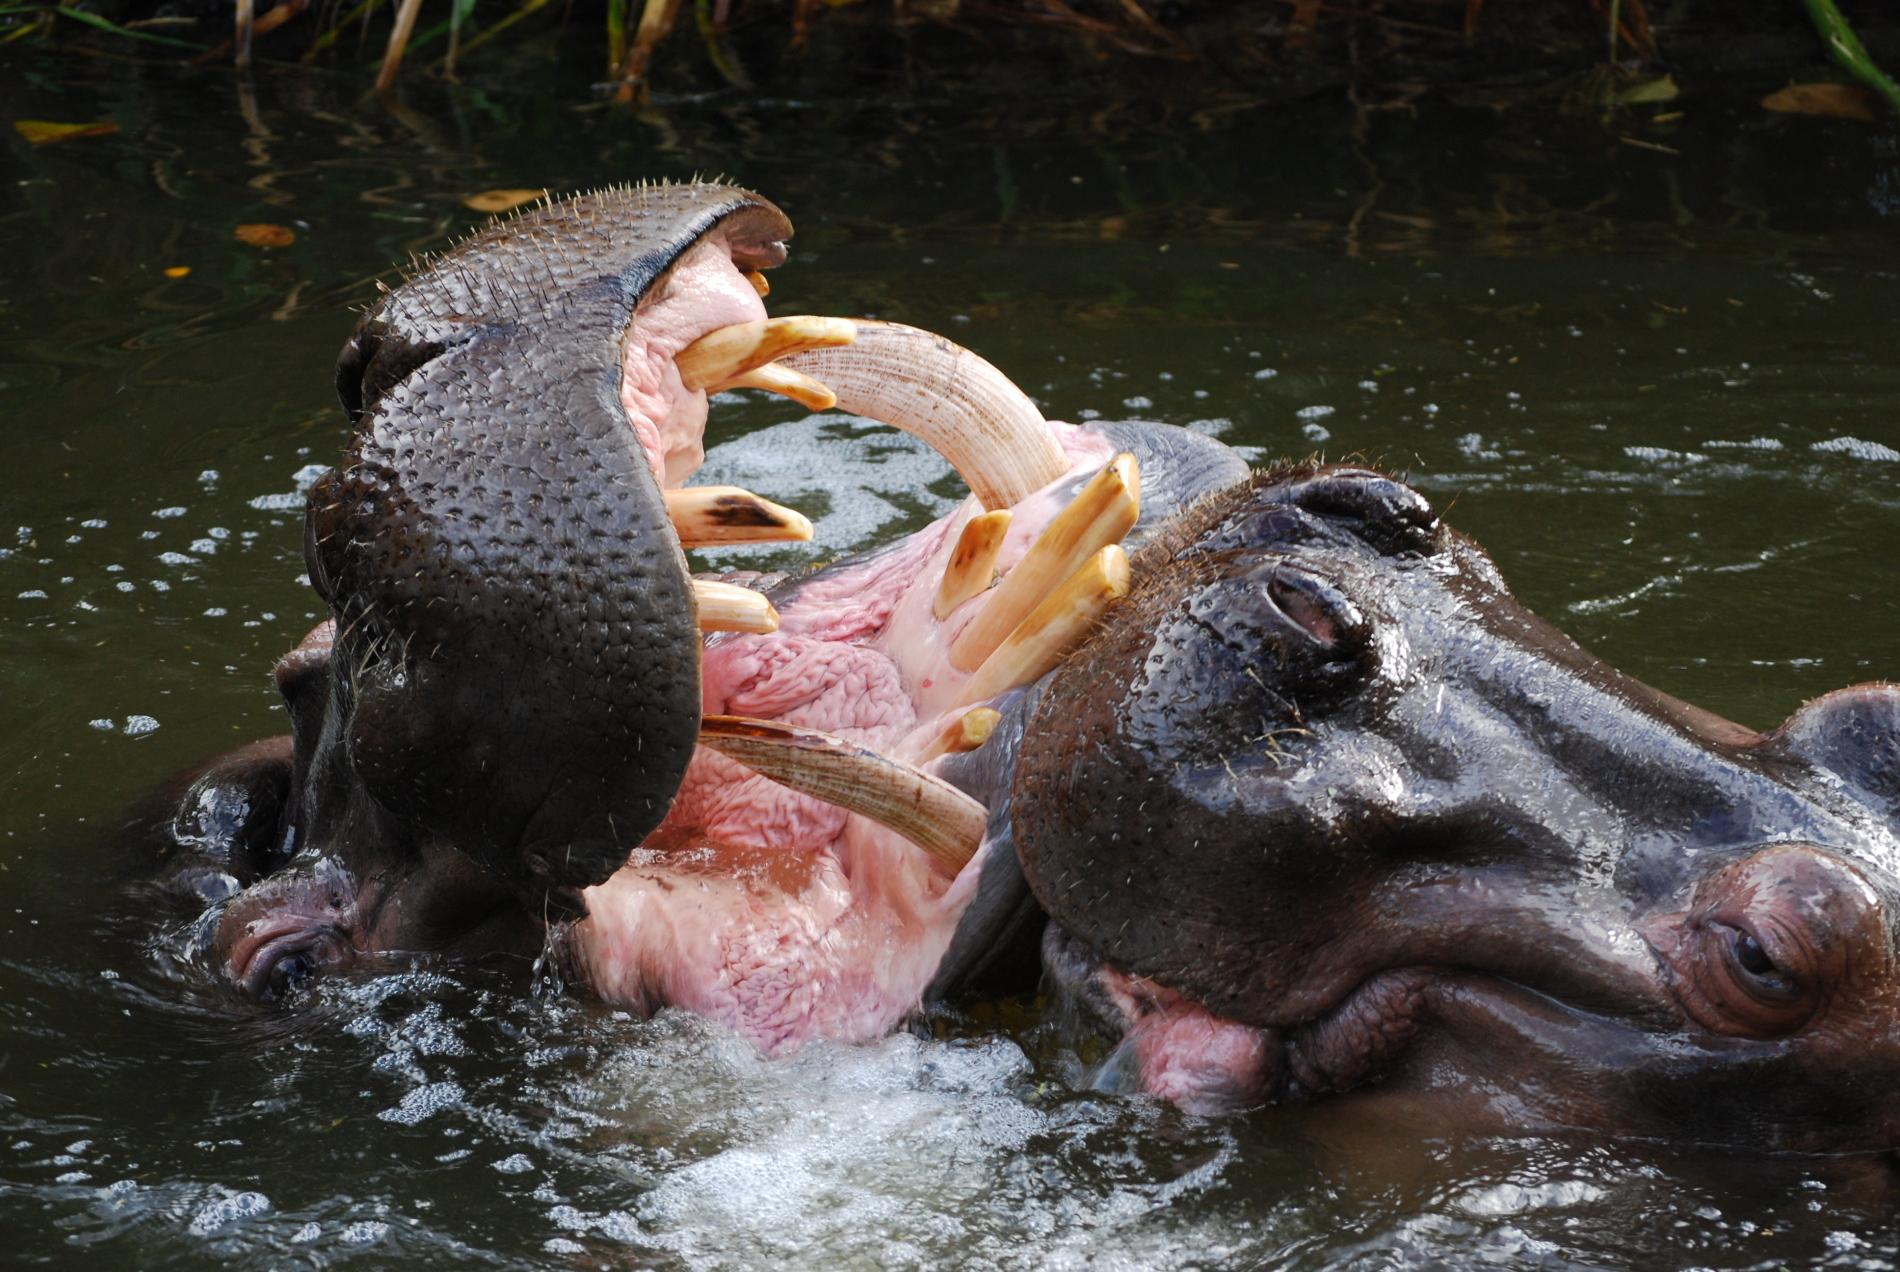 Hippopotamus amphibius |  Peripitus/Wikimedia Commons  [ CC BY-SA 3.0 ]